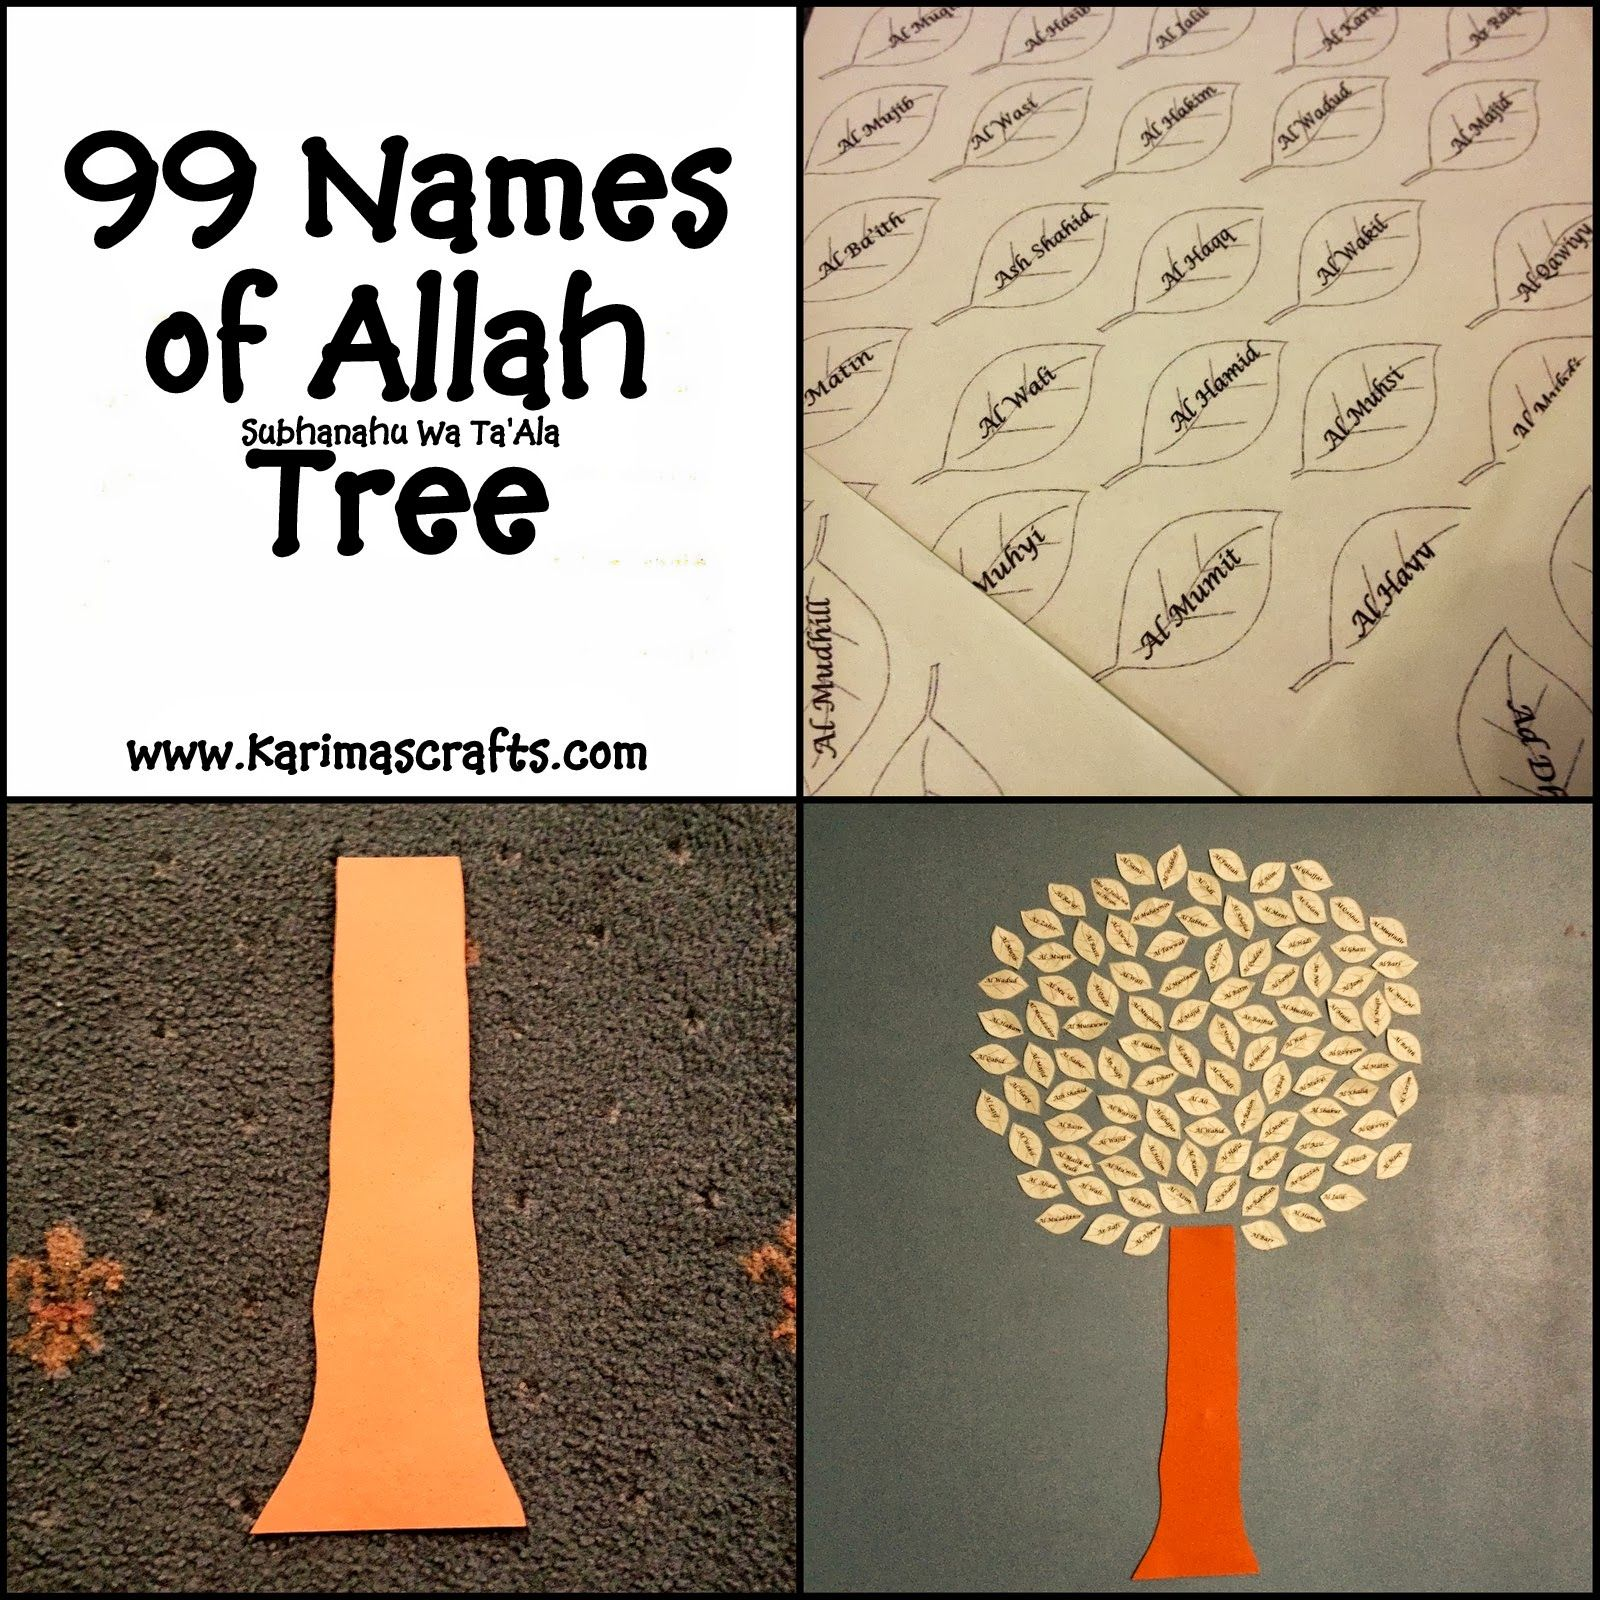 99 Names Of Allah Tree